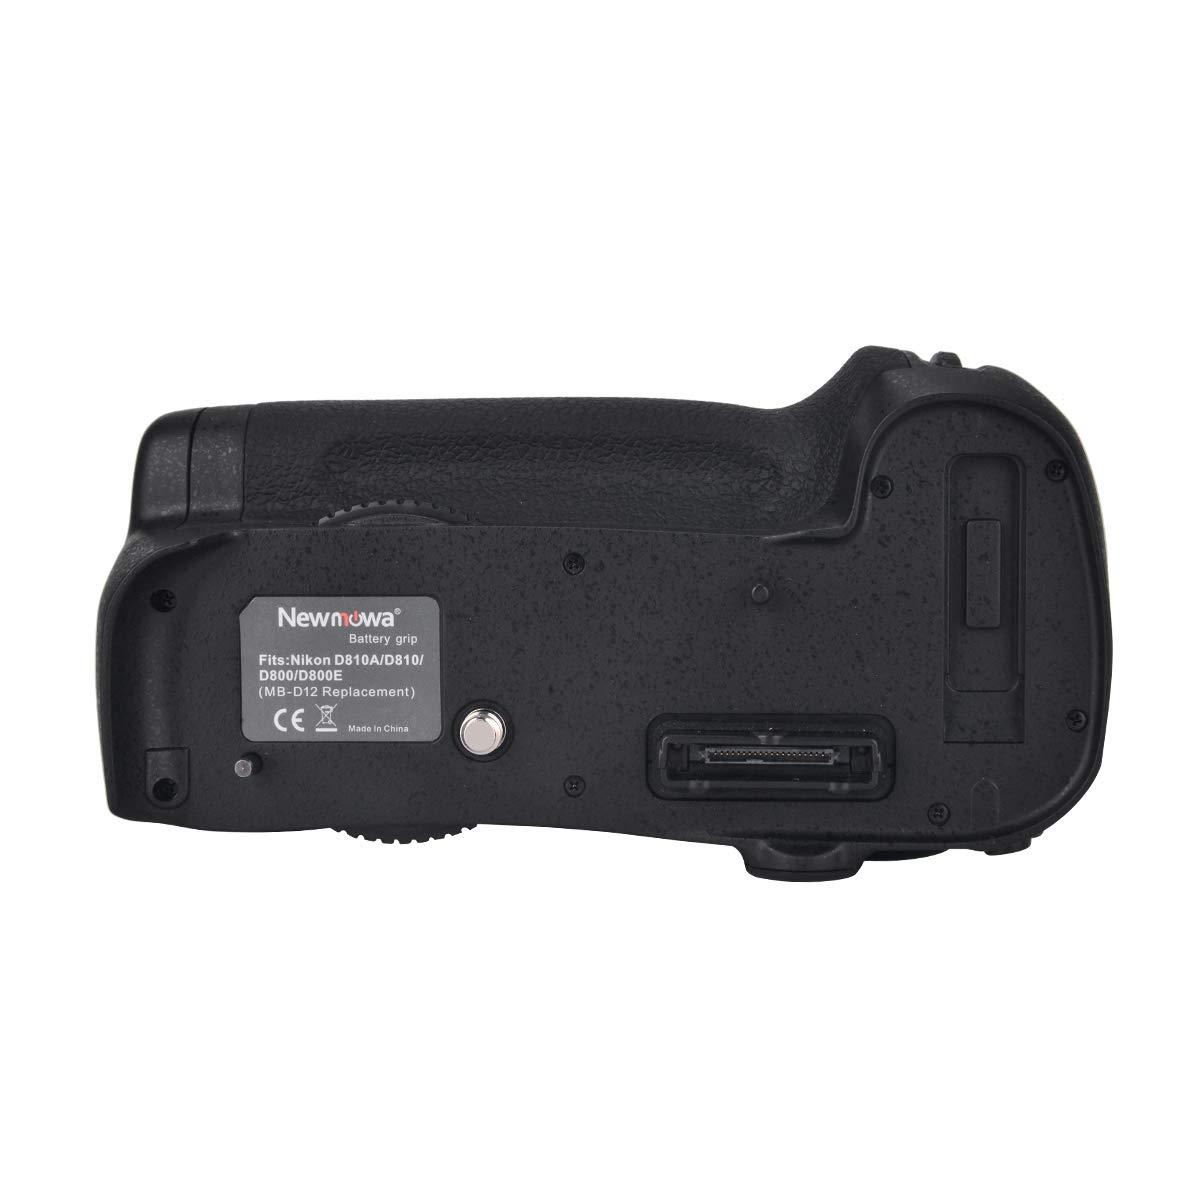 Newmowa Mango de Repuesto Battery Grip para Nikon D800/D800E/D810 ...